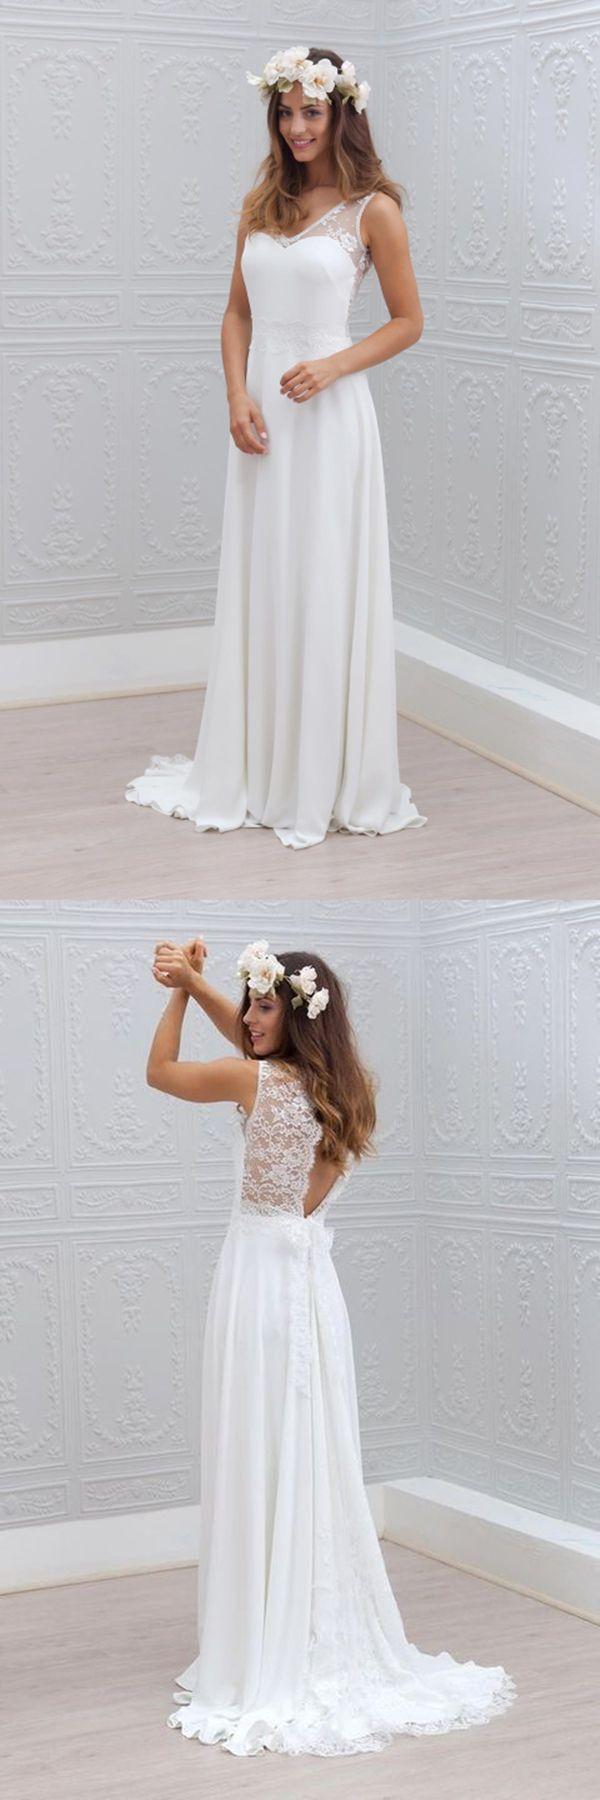 Simple White Wedding Dresses Beach Wedding Dress Open Back Long Bridal Gowns Lace Wedding Dress Wedding Gowns Lace Wedding Dress Chiffon White Wedding Dresses